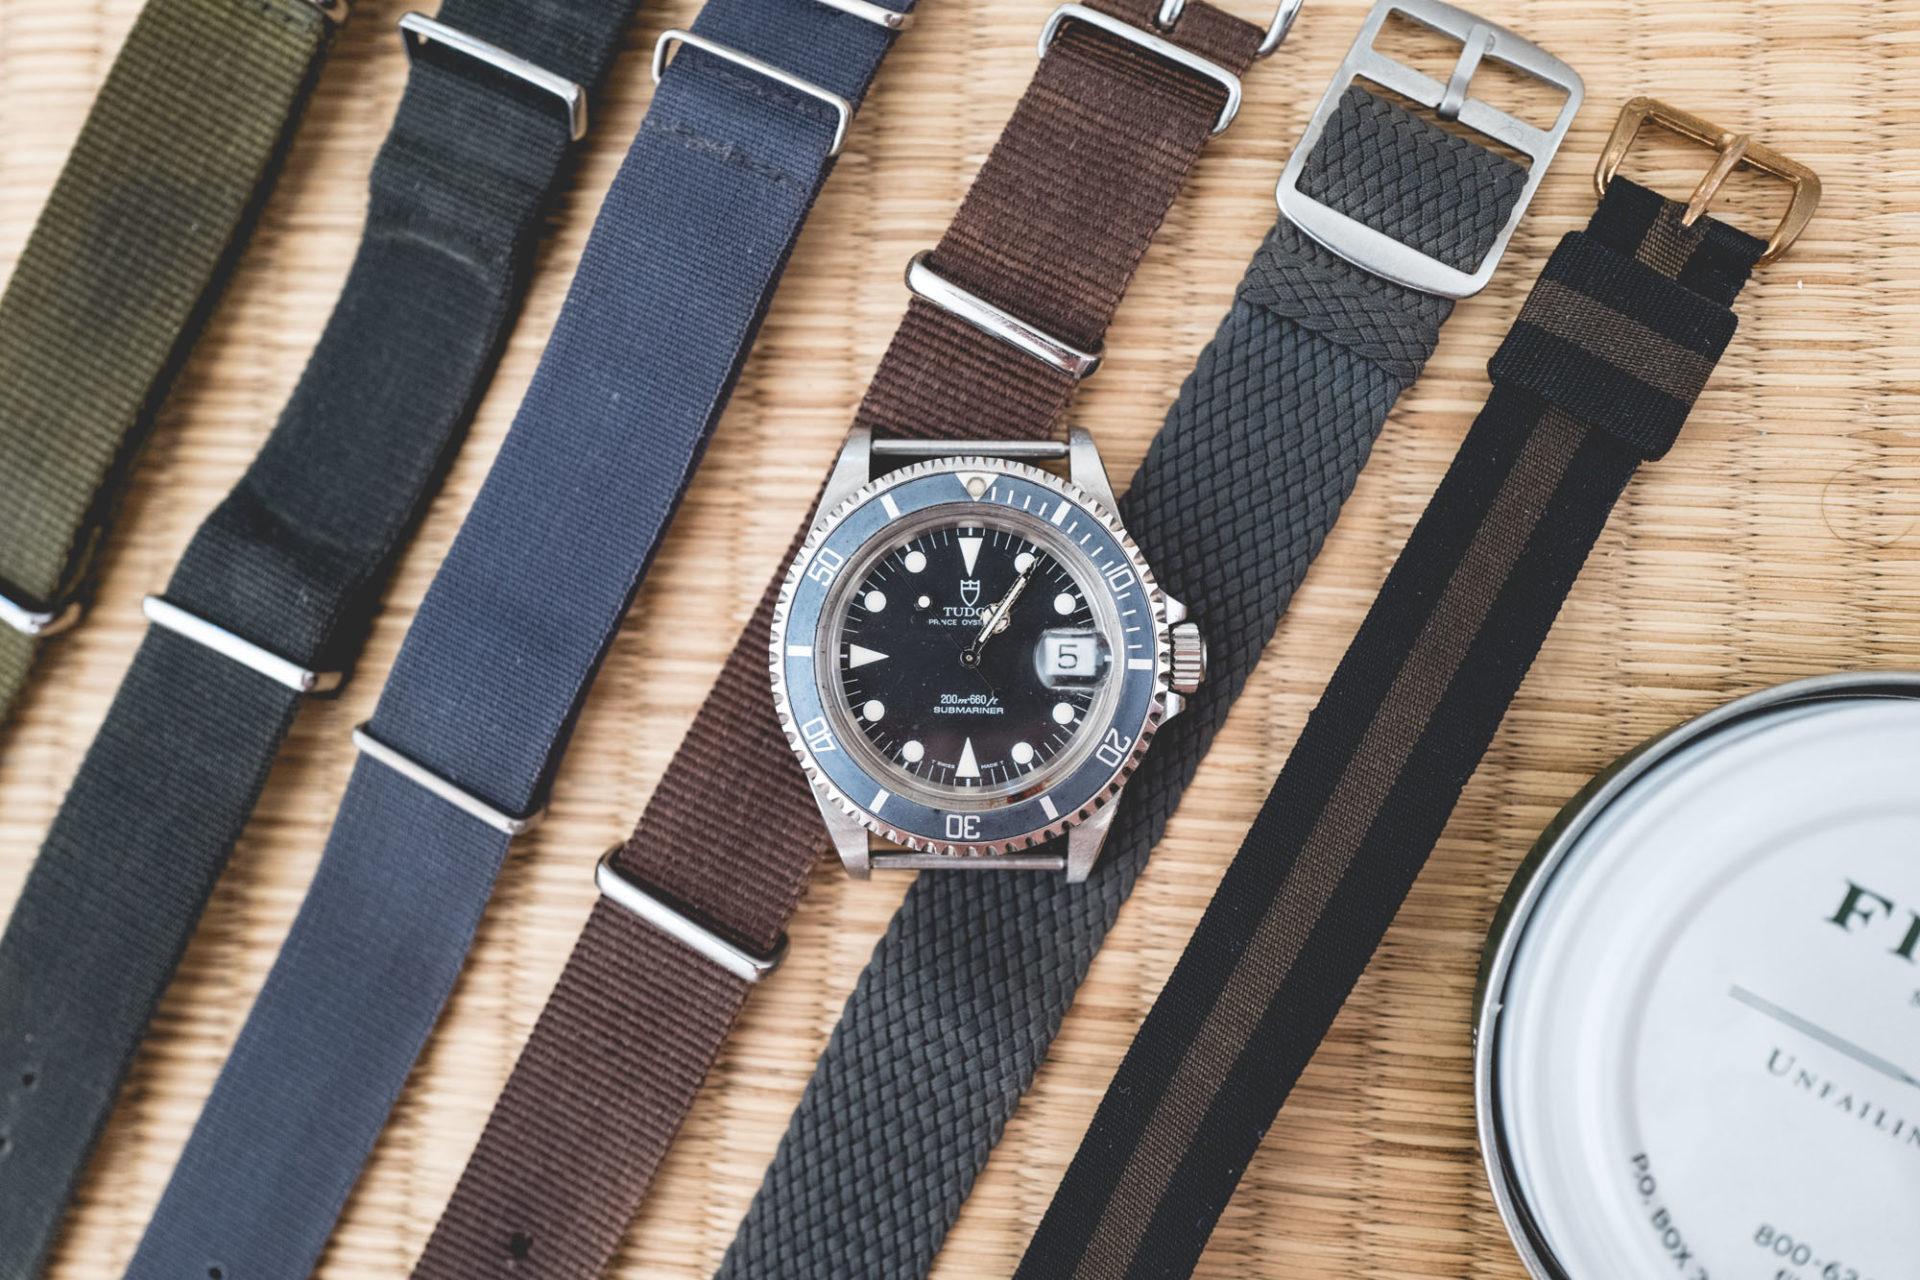 Tudor 79090 - Bracelets tissus cirés